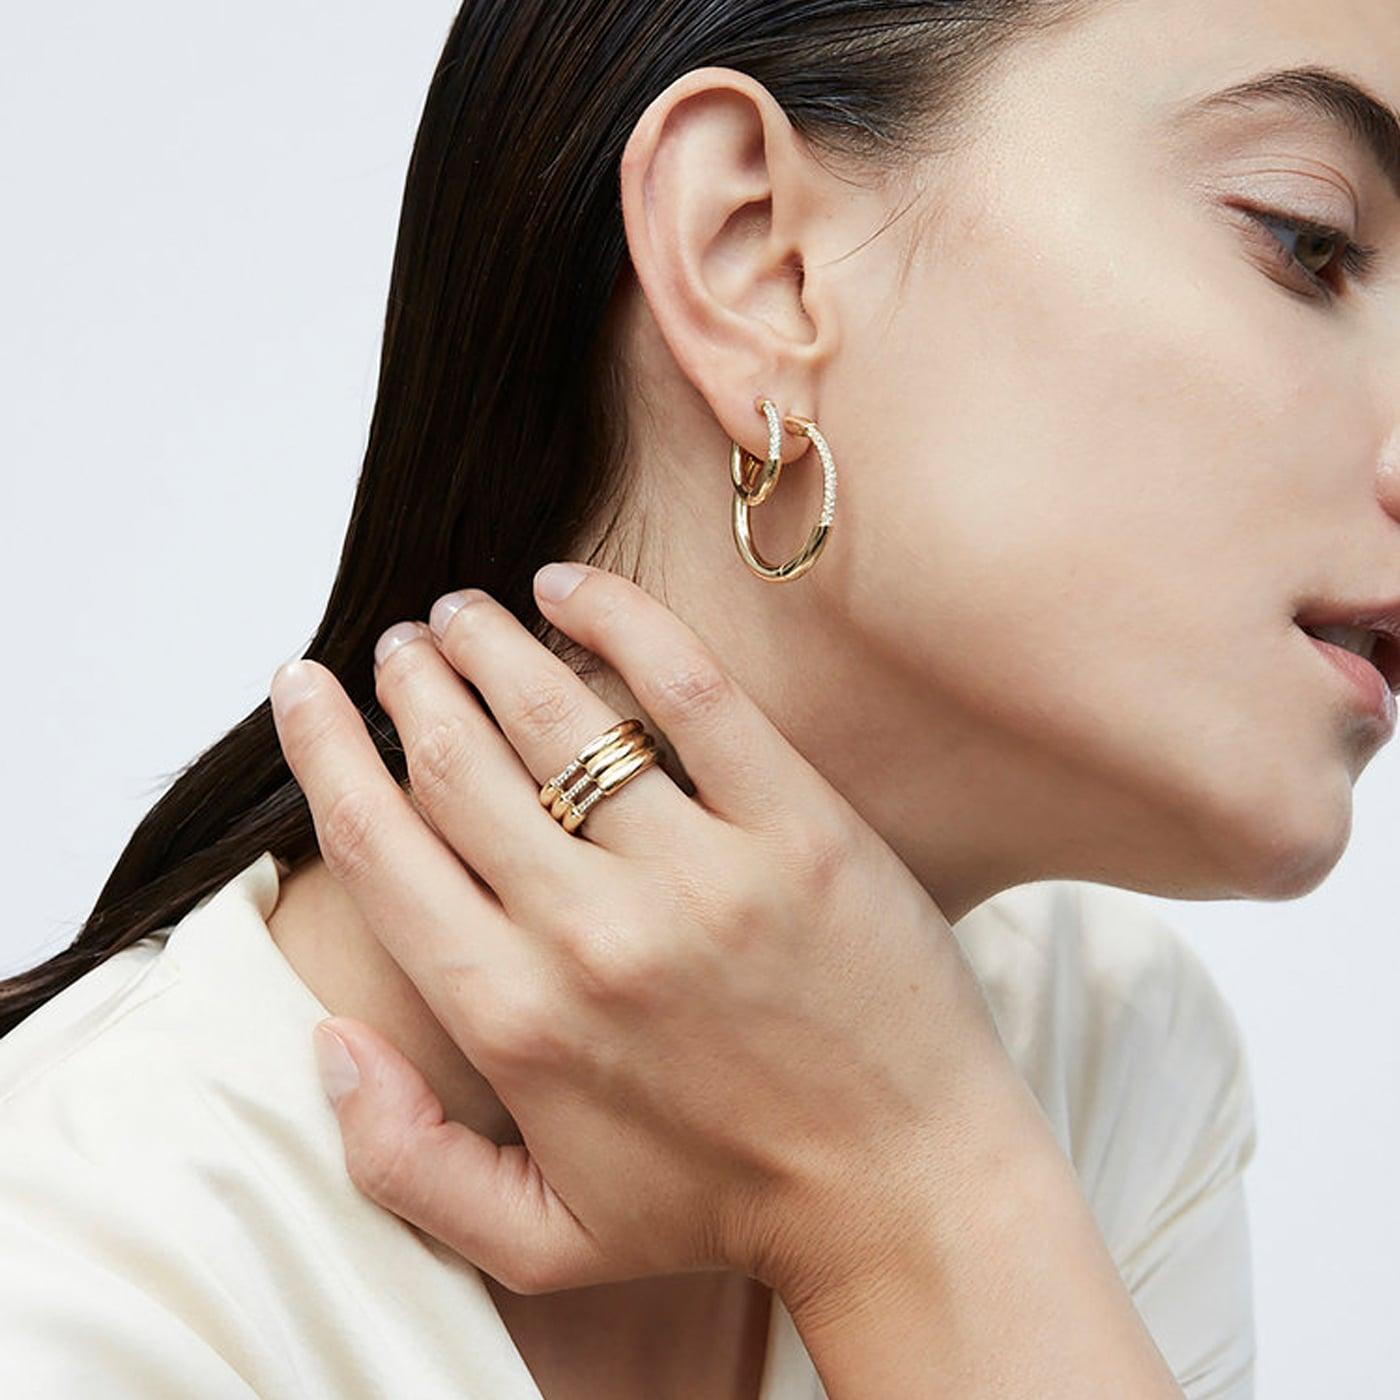 How To Clean Jewelry Popsugar Fashion